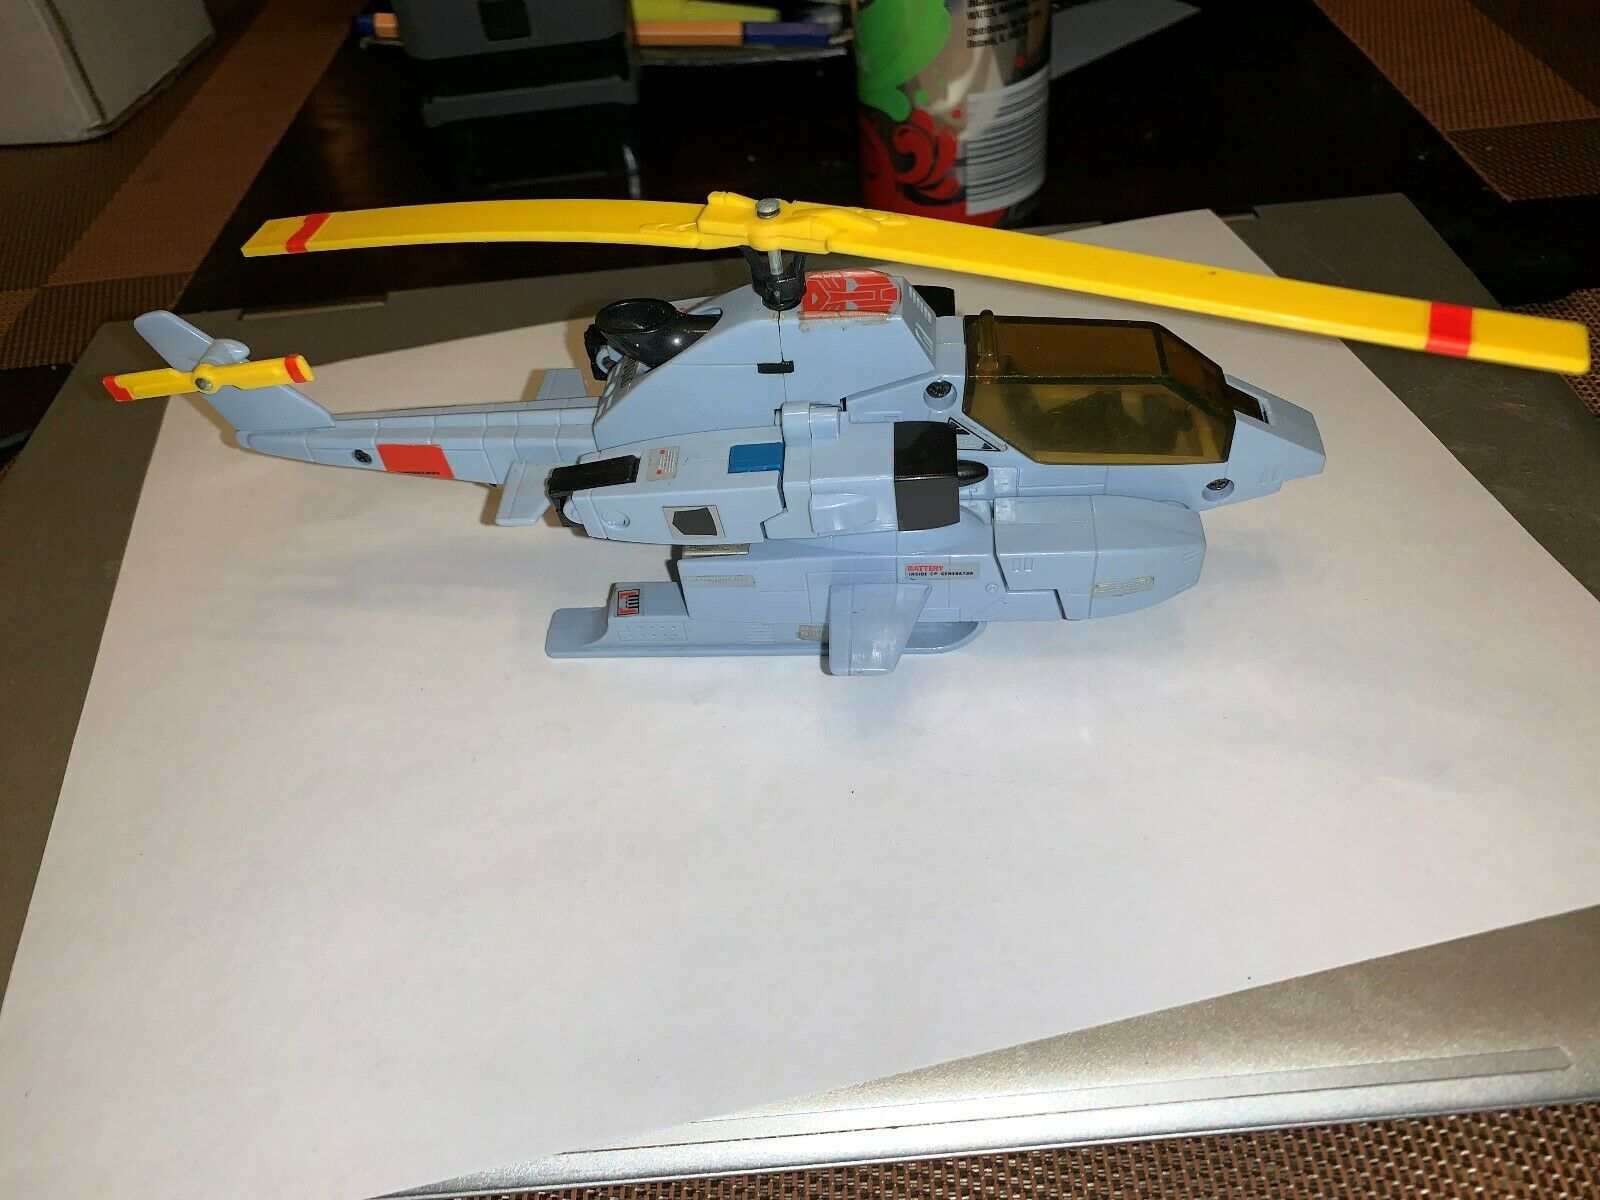 Whirl 1985 Vintage G1 Transformers BELL AH -1 Cobra Action Figure LQQK